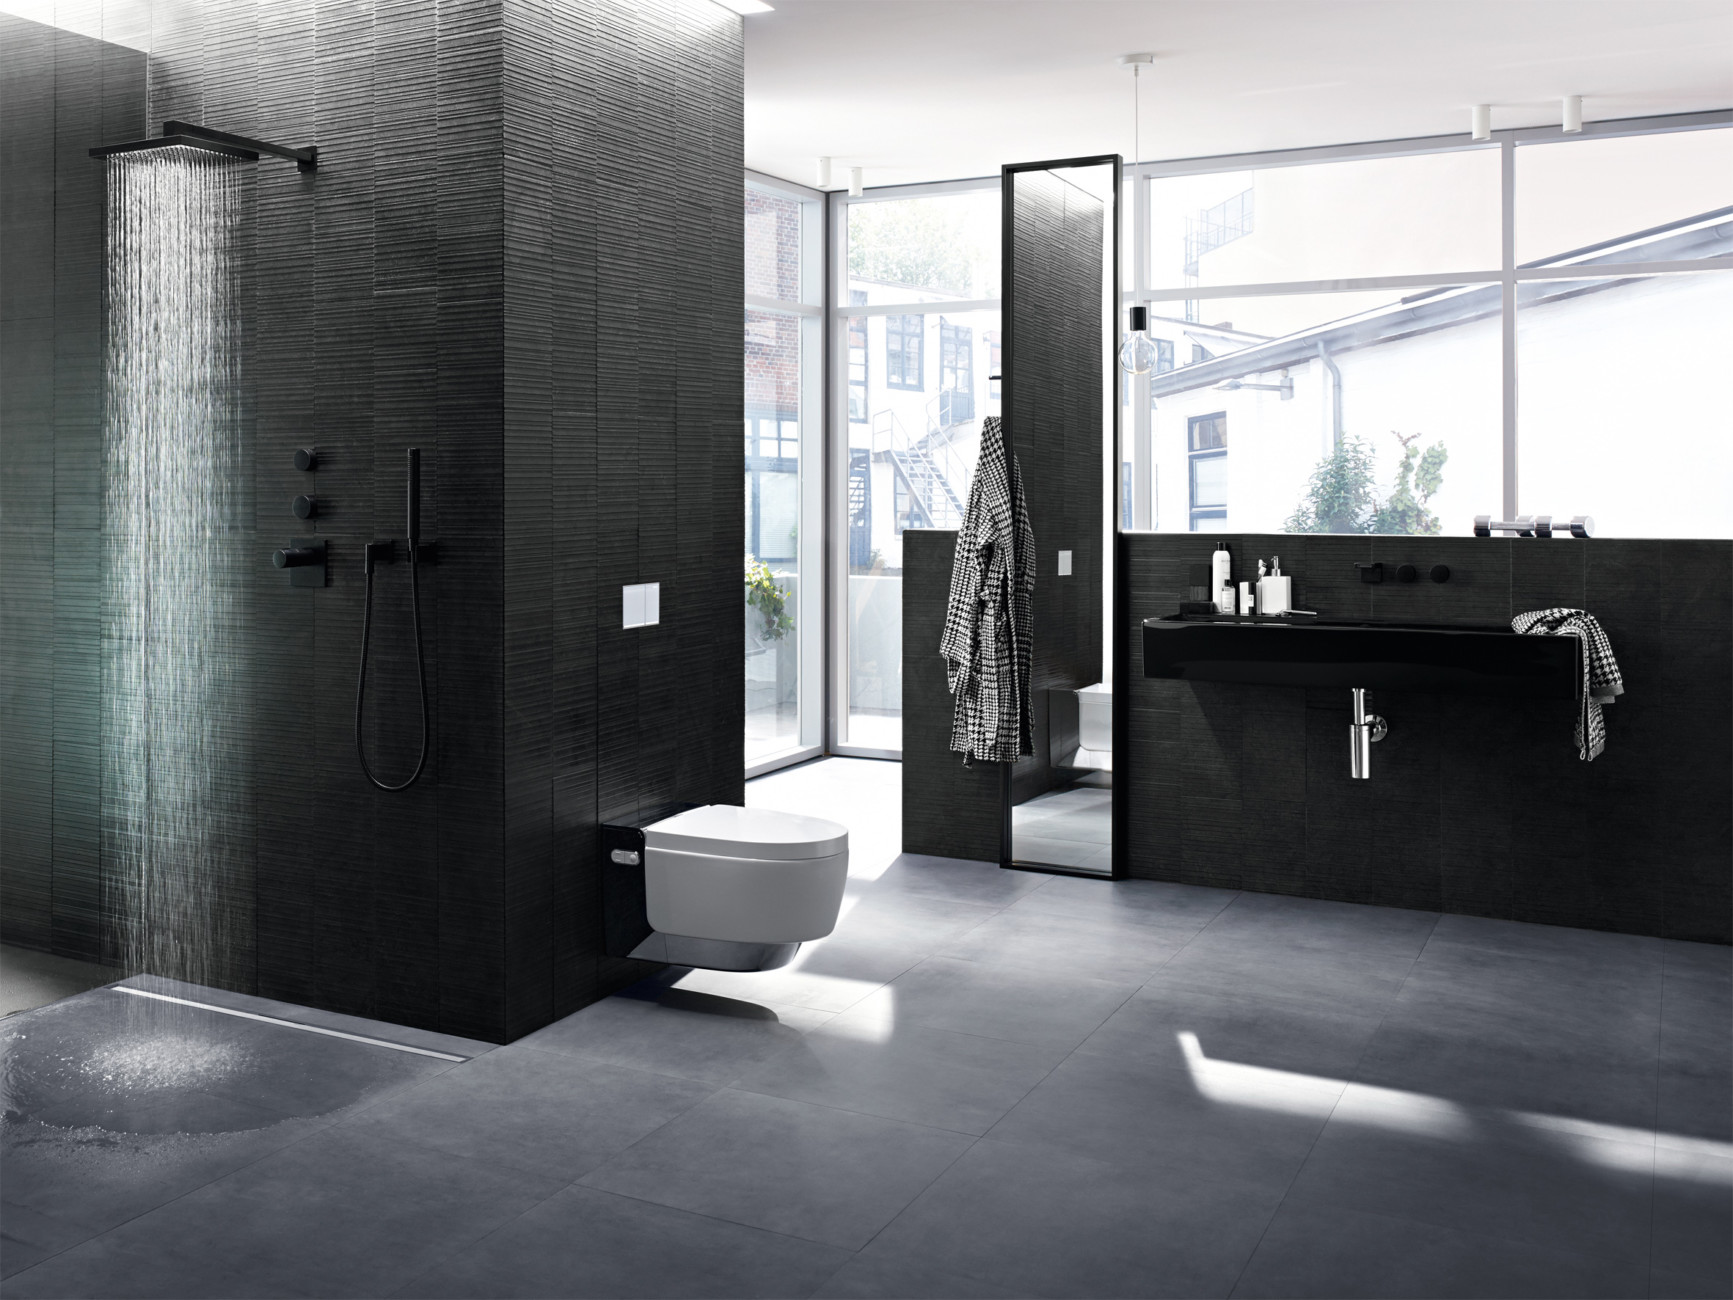 Badezimmer-Komfort bis ins hohe Alter - Kurt Burmeister GmbH Kiel ...